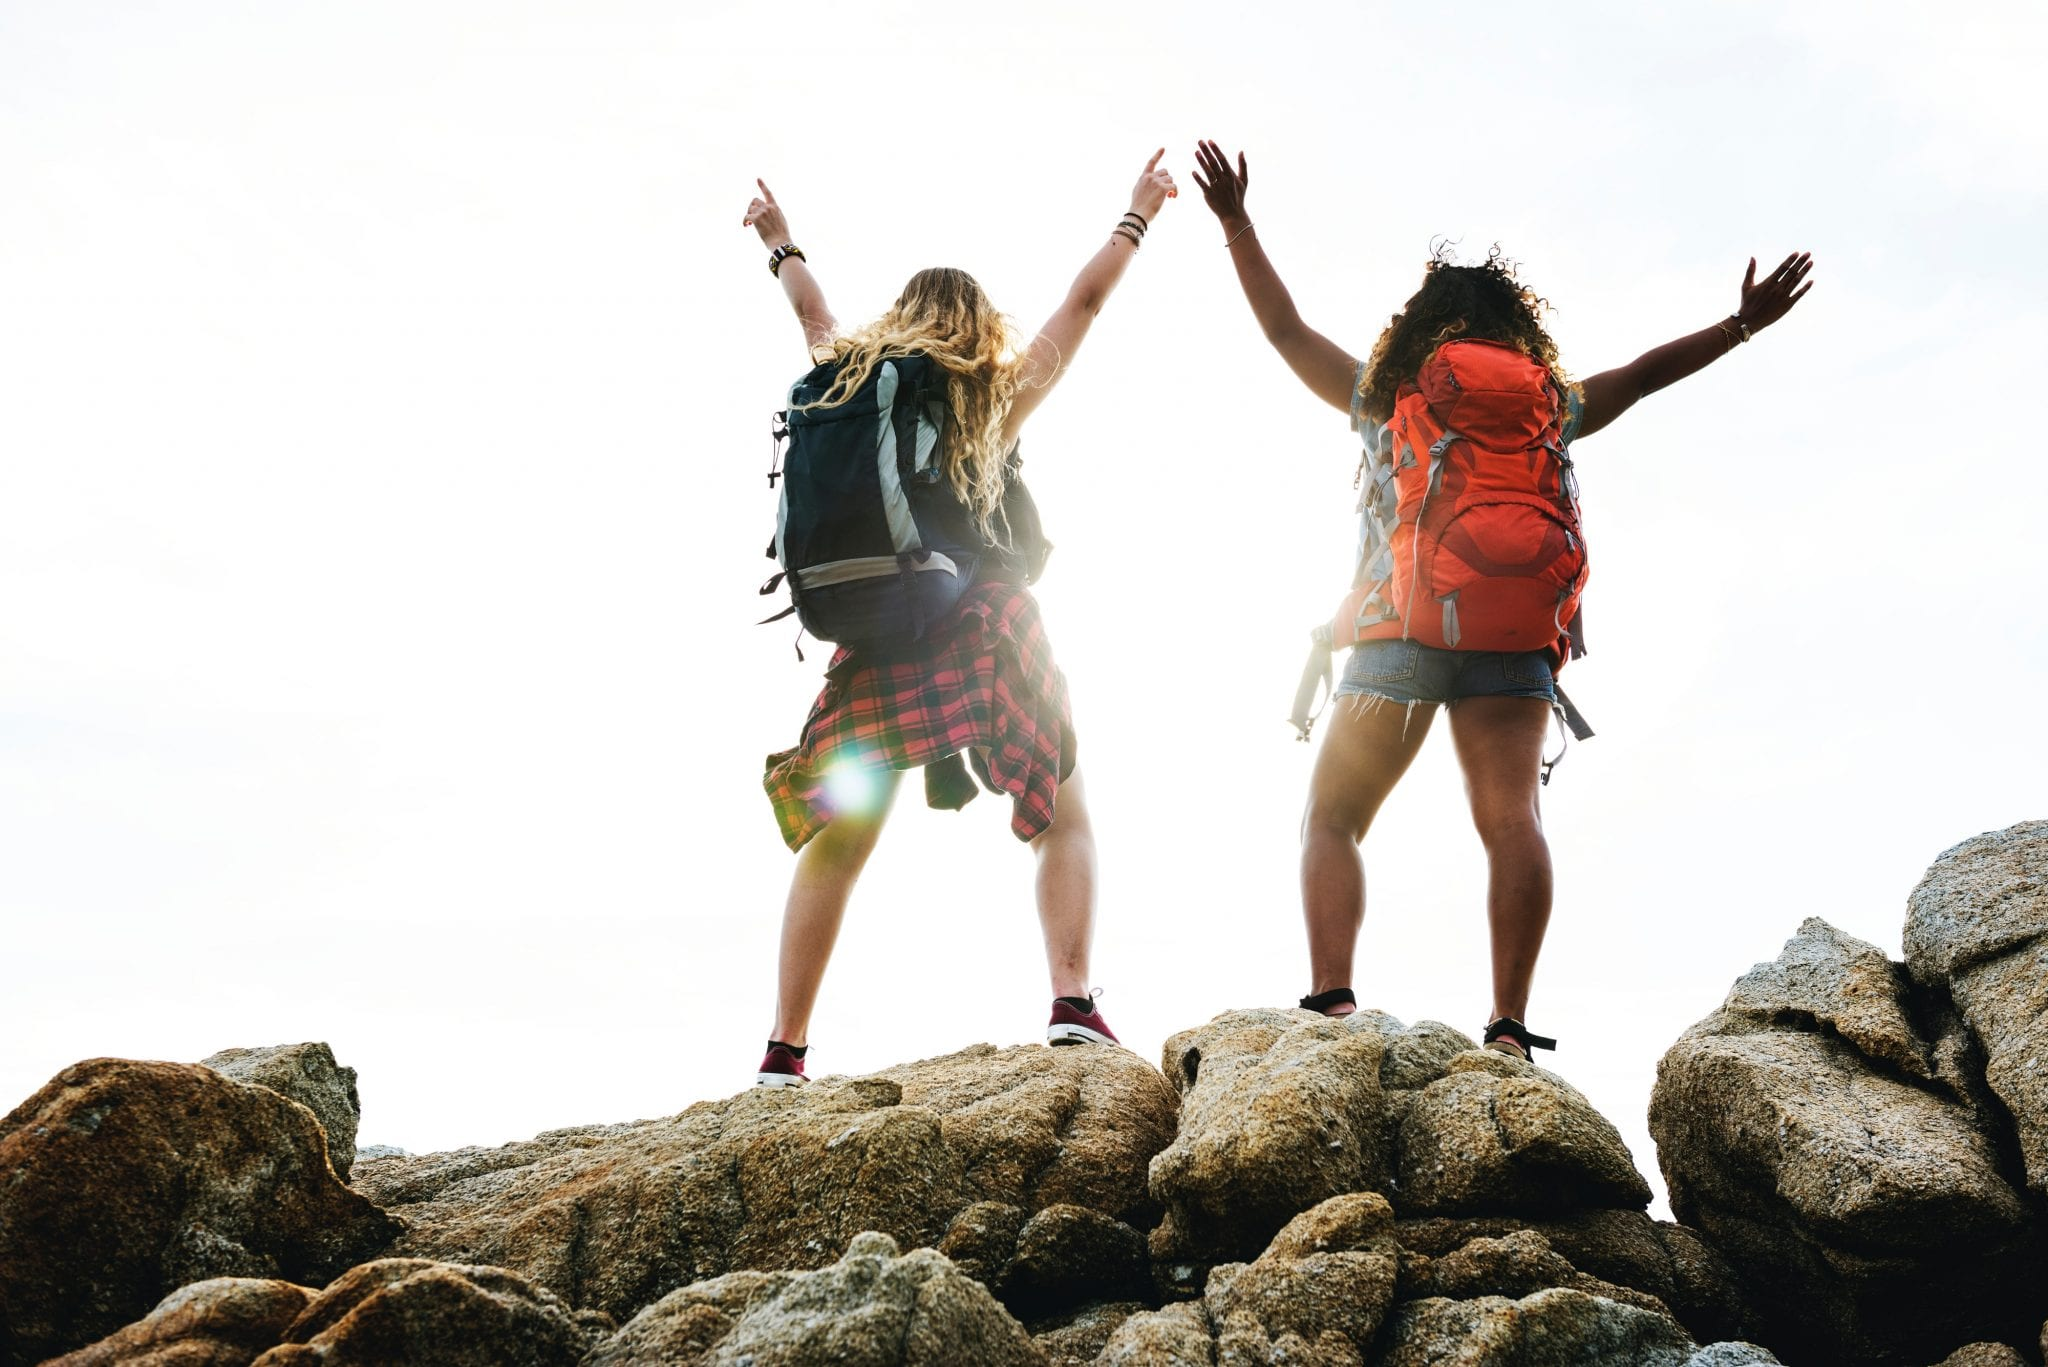 Two women standing on rock